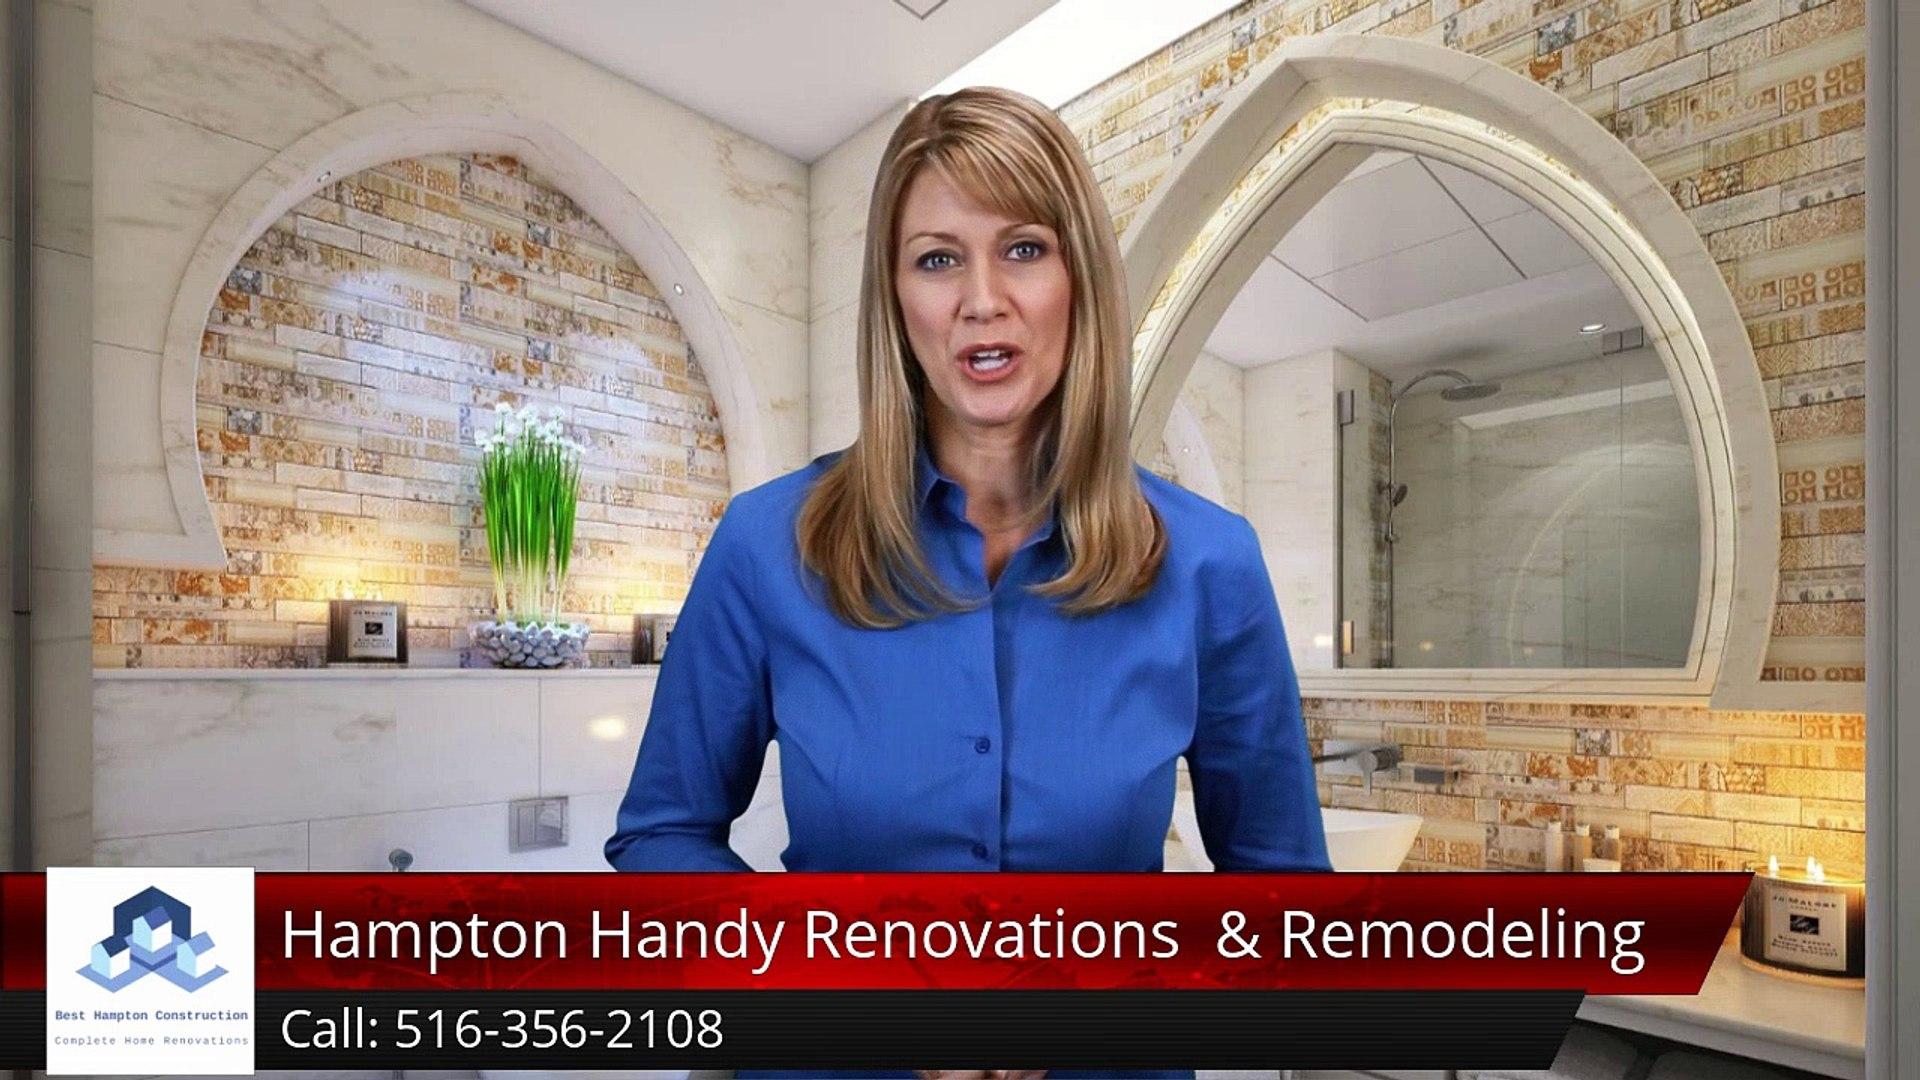 Hampton Handy ShirleySuperbFive Star Review by Stanley V.